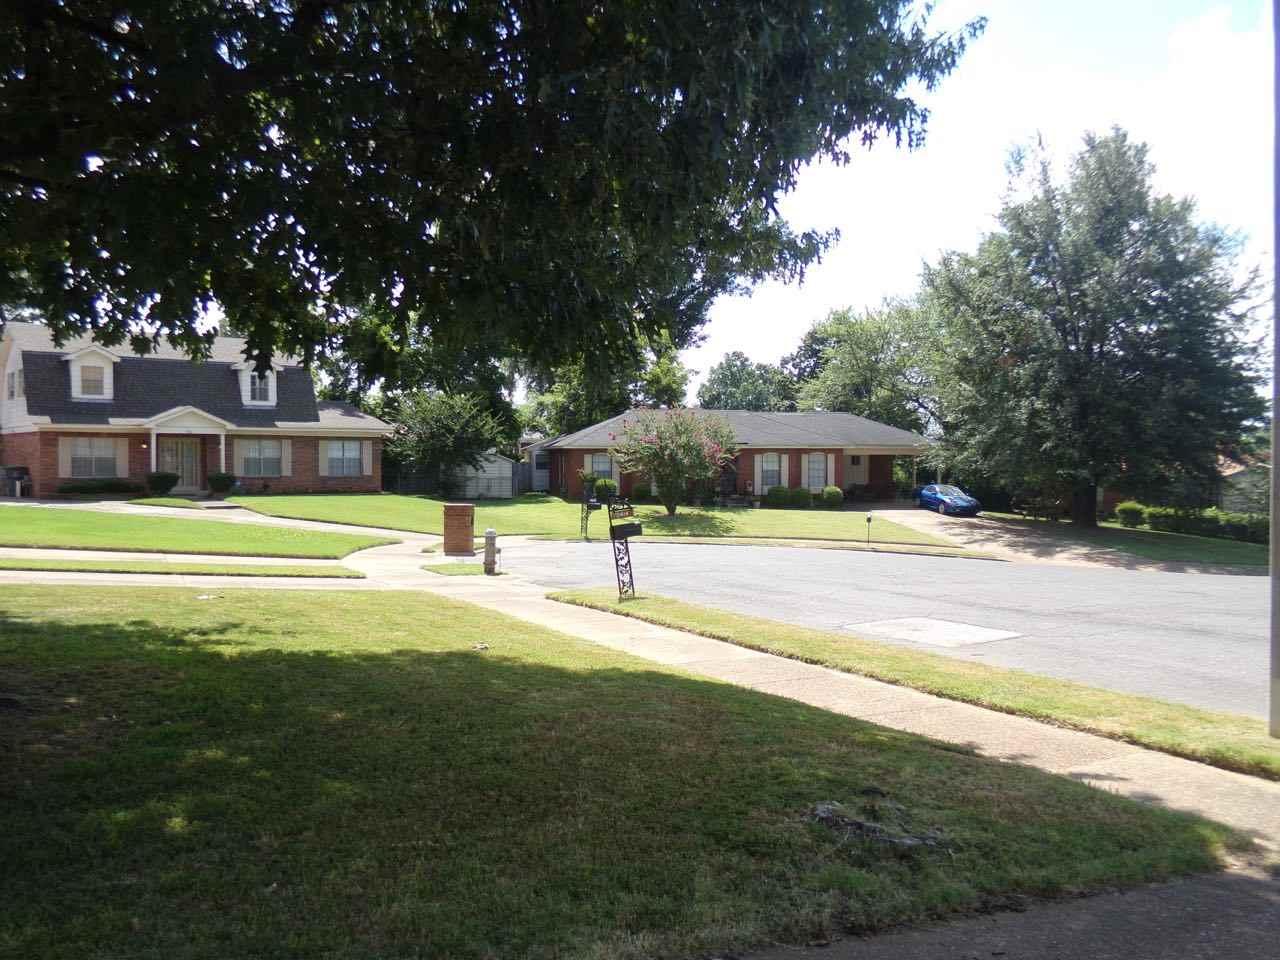 2413 Sherrie Memphis, TN 38114 - MLS #: 10007117